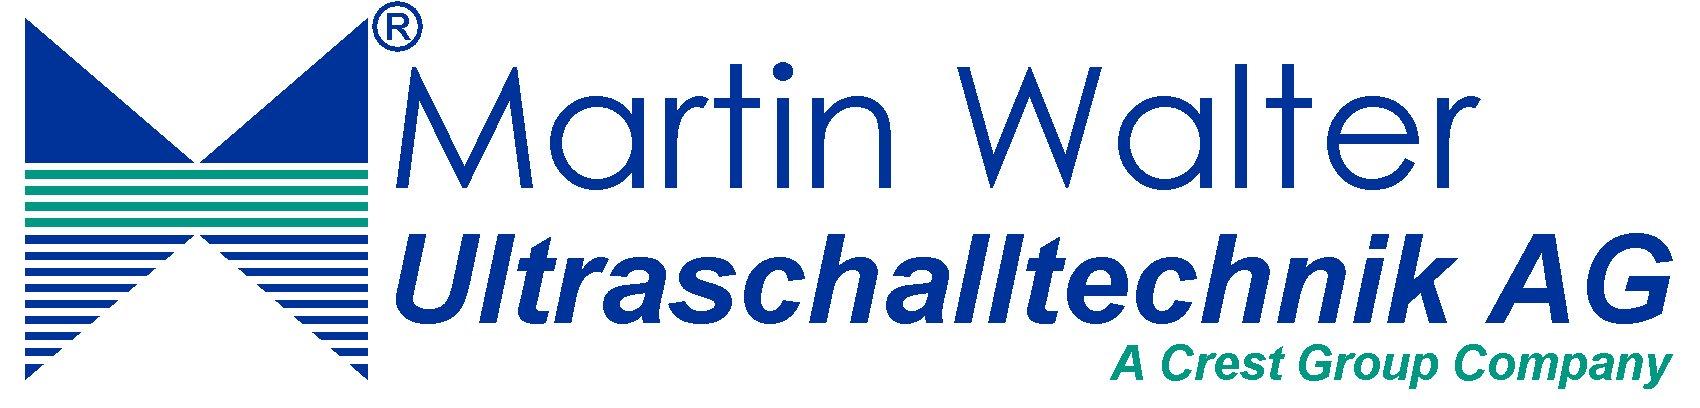 Martin Walter, fabricant de matériels de nettoyage par Ultrasons